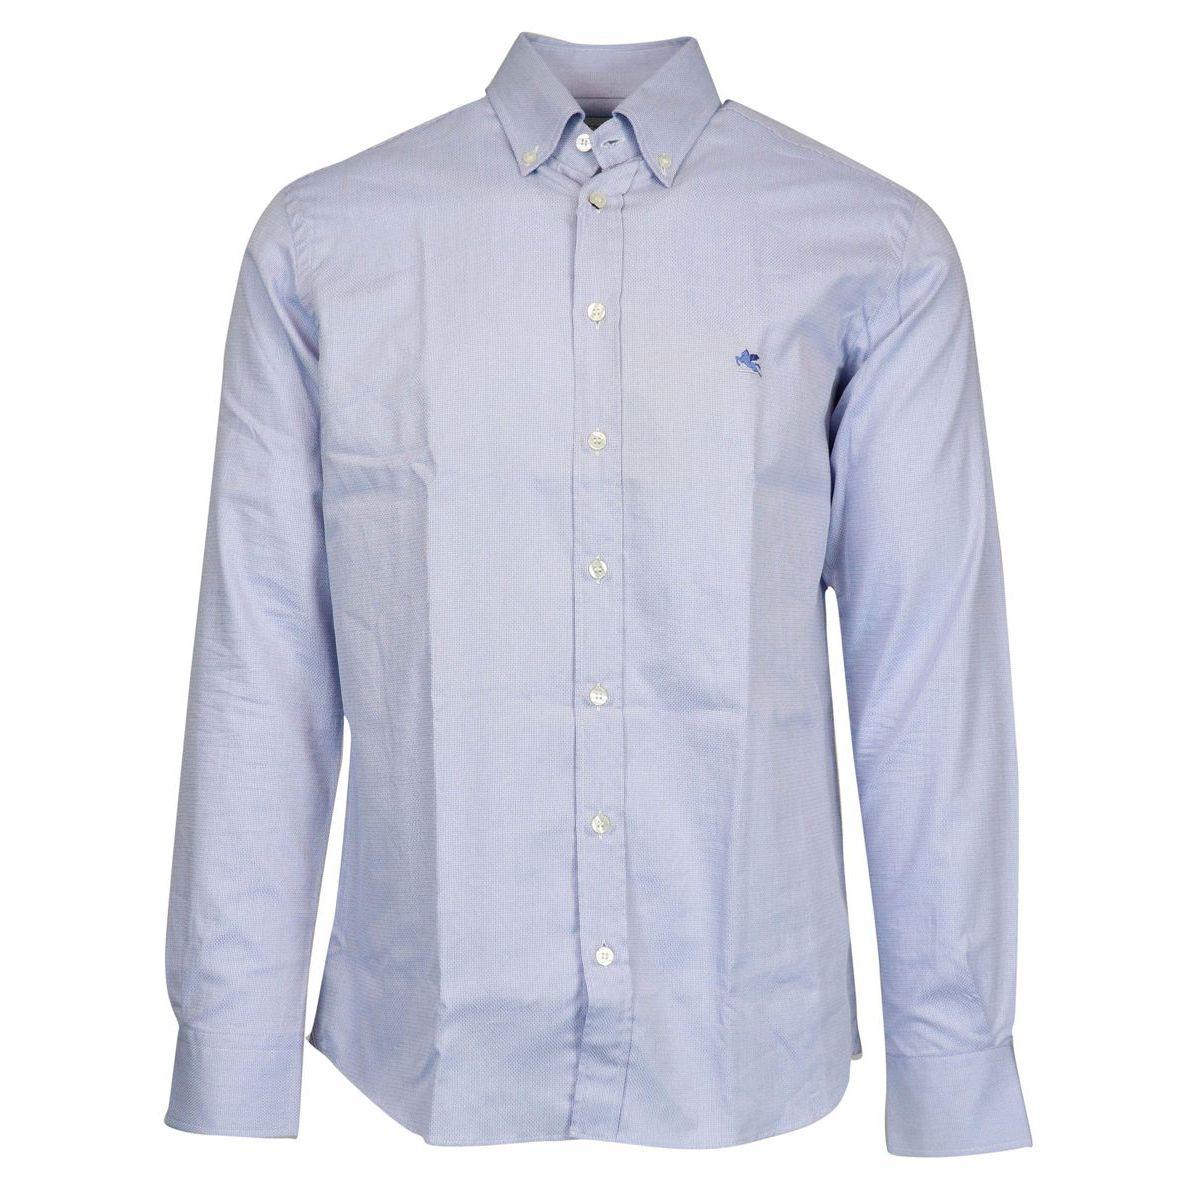 Regular button down cotton shirt with logo Heavenly Etro